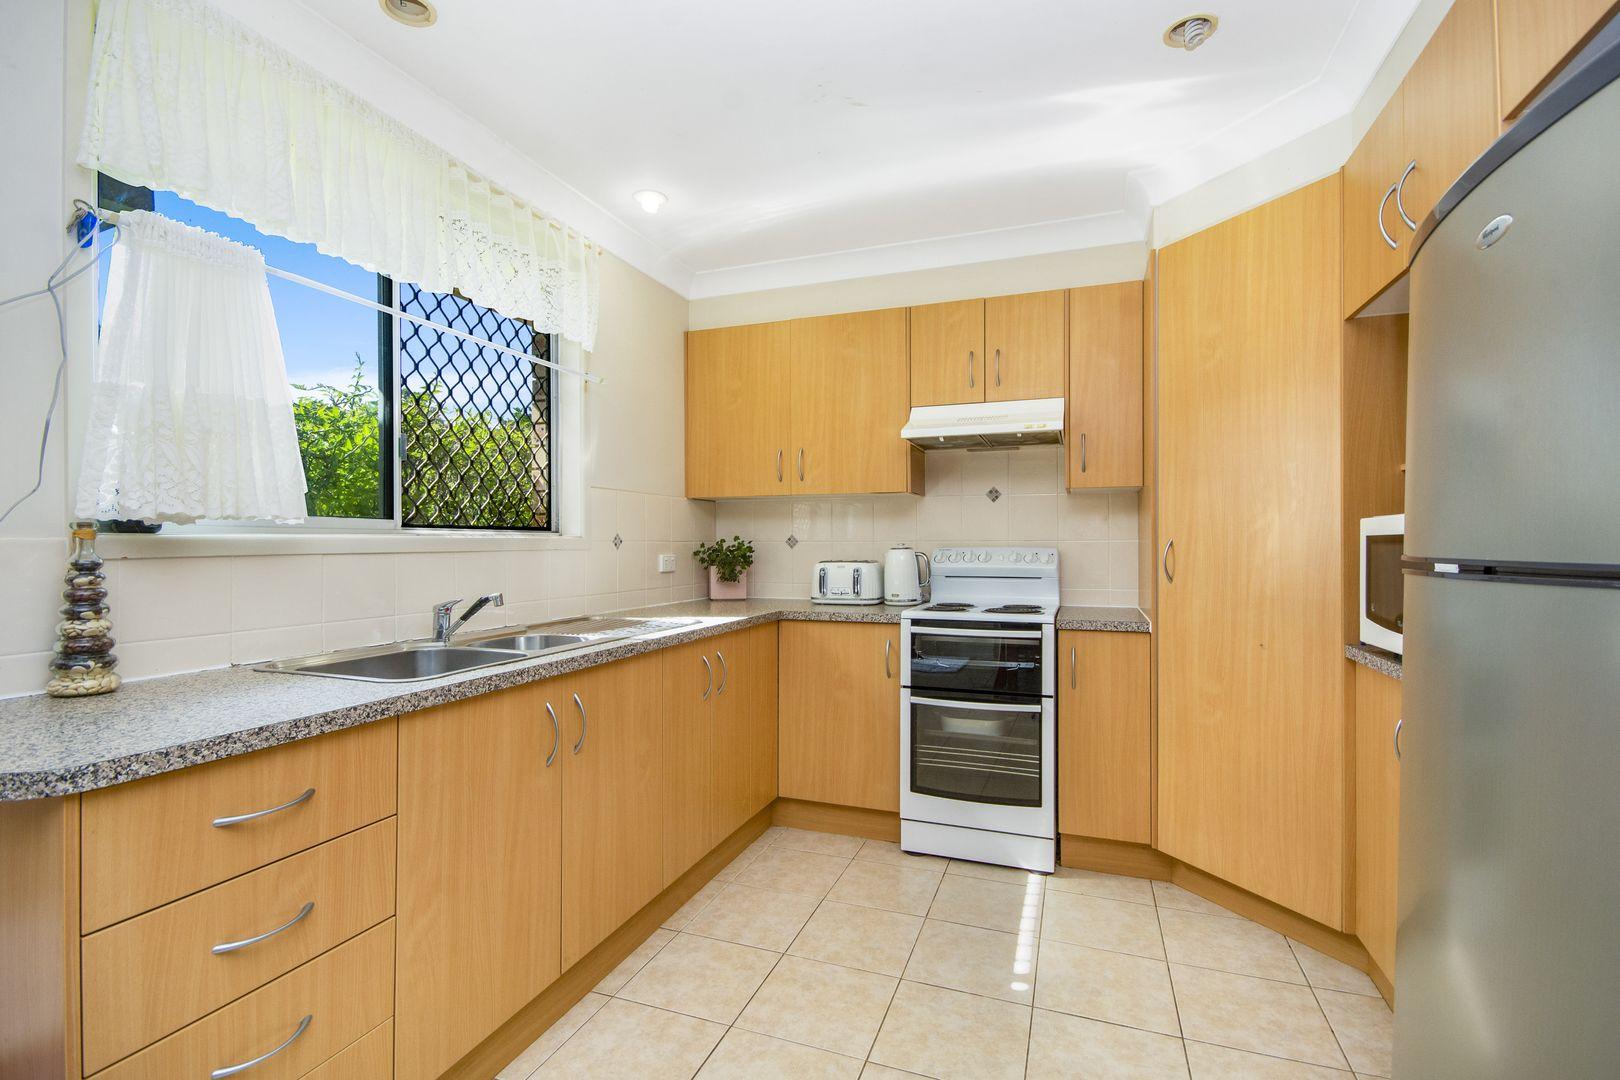 48 Coonawarra Court, Yamba NSW 2464, Image 1